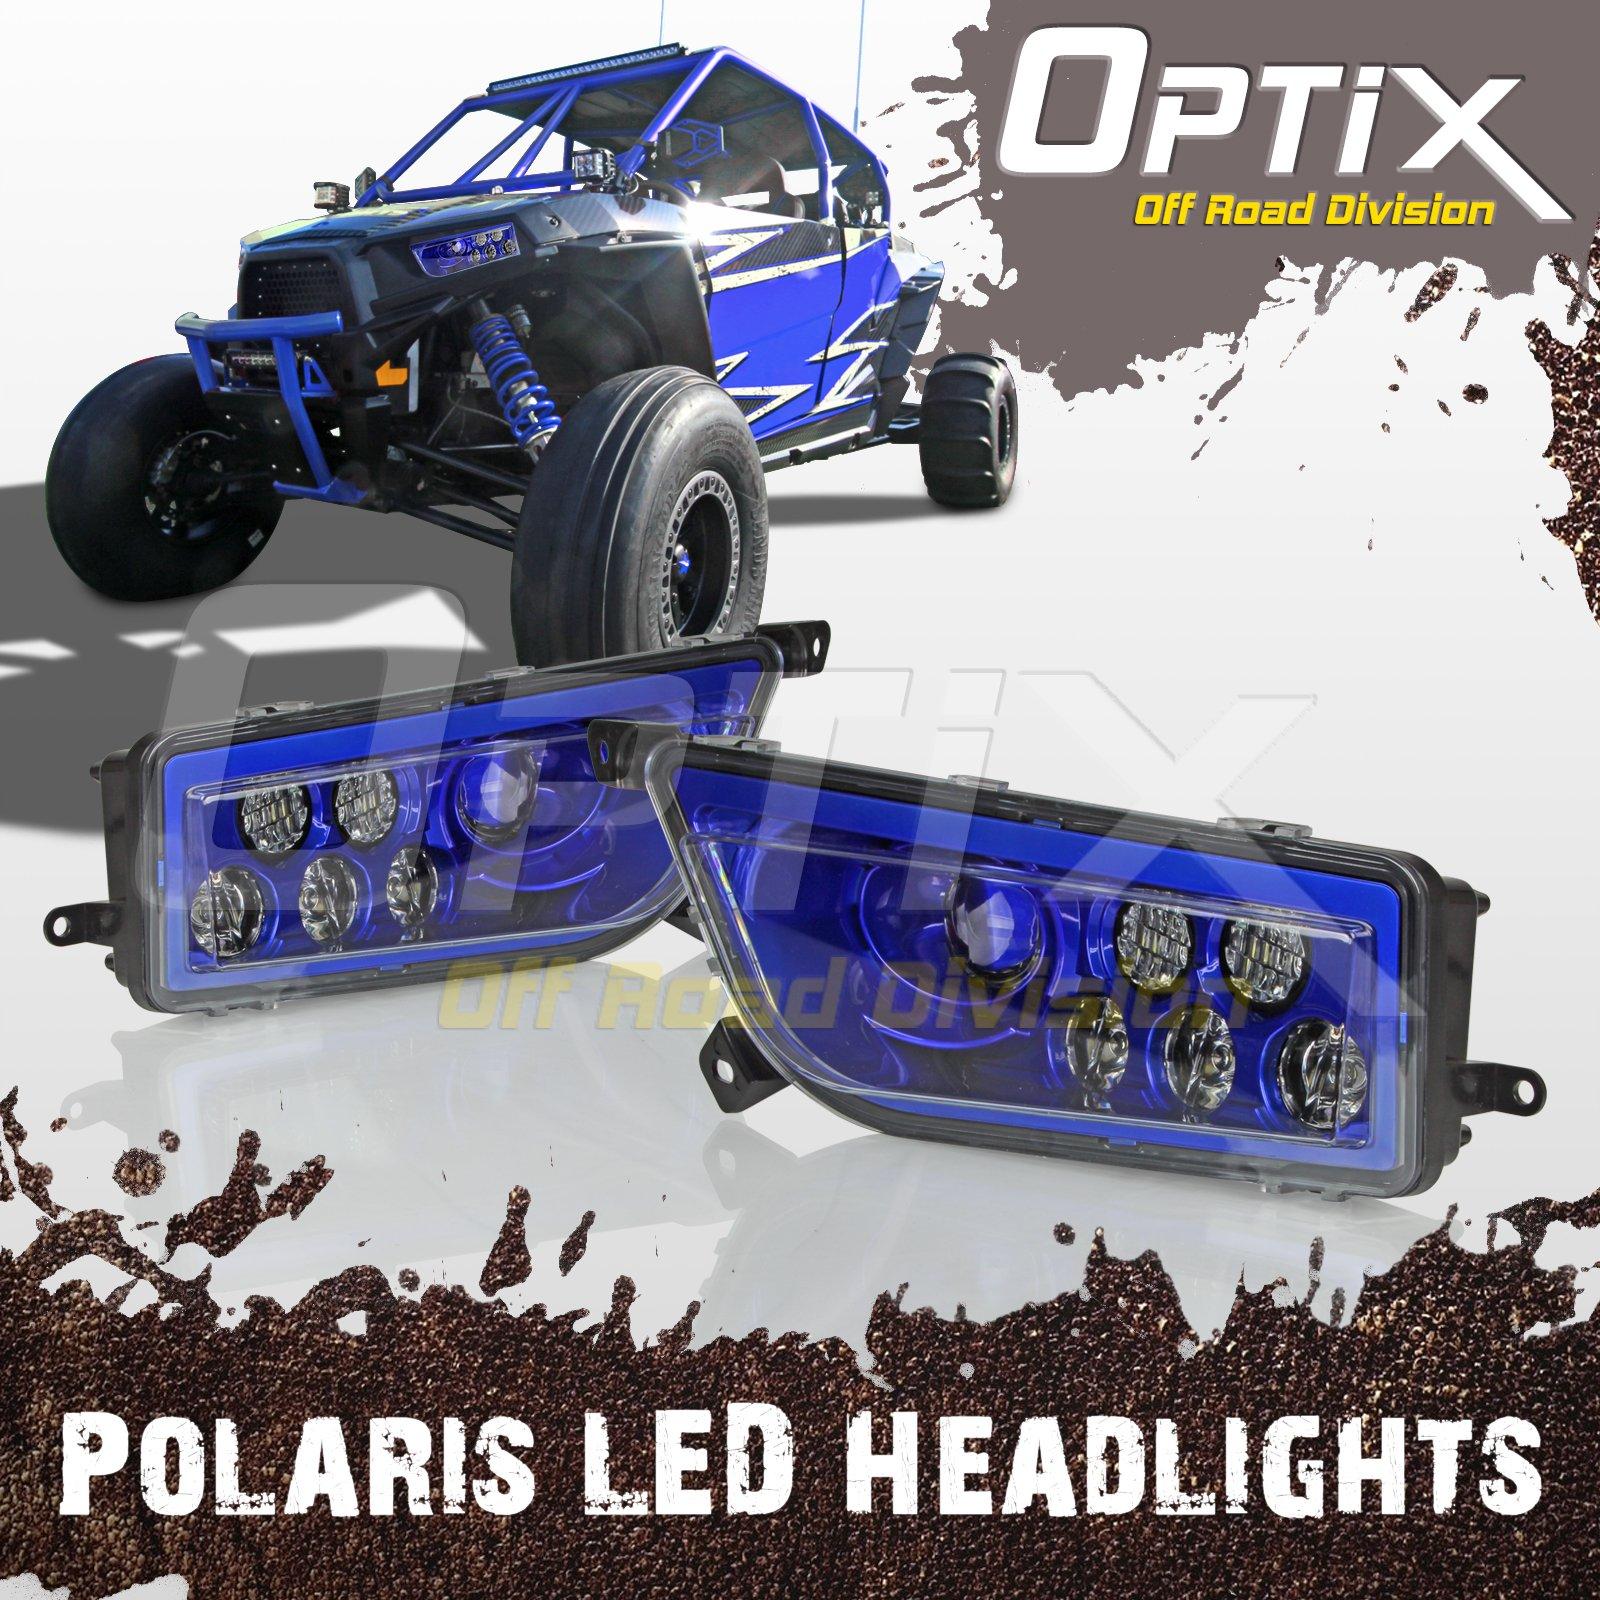 Genuine Polaris Part Number 2410503 ASM-HEADLIGHT for Polaris ATV Motorcycle Snowmobile// or Watercraft